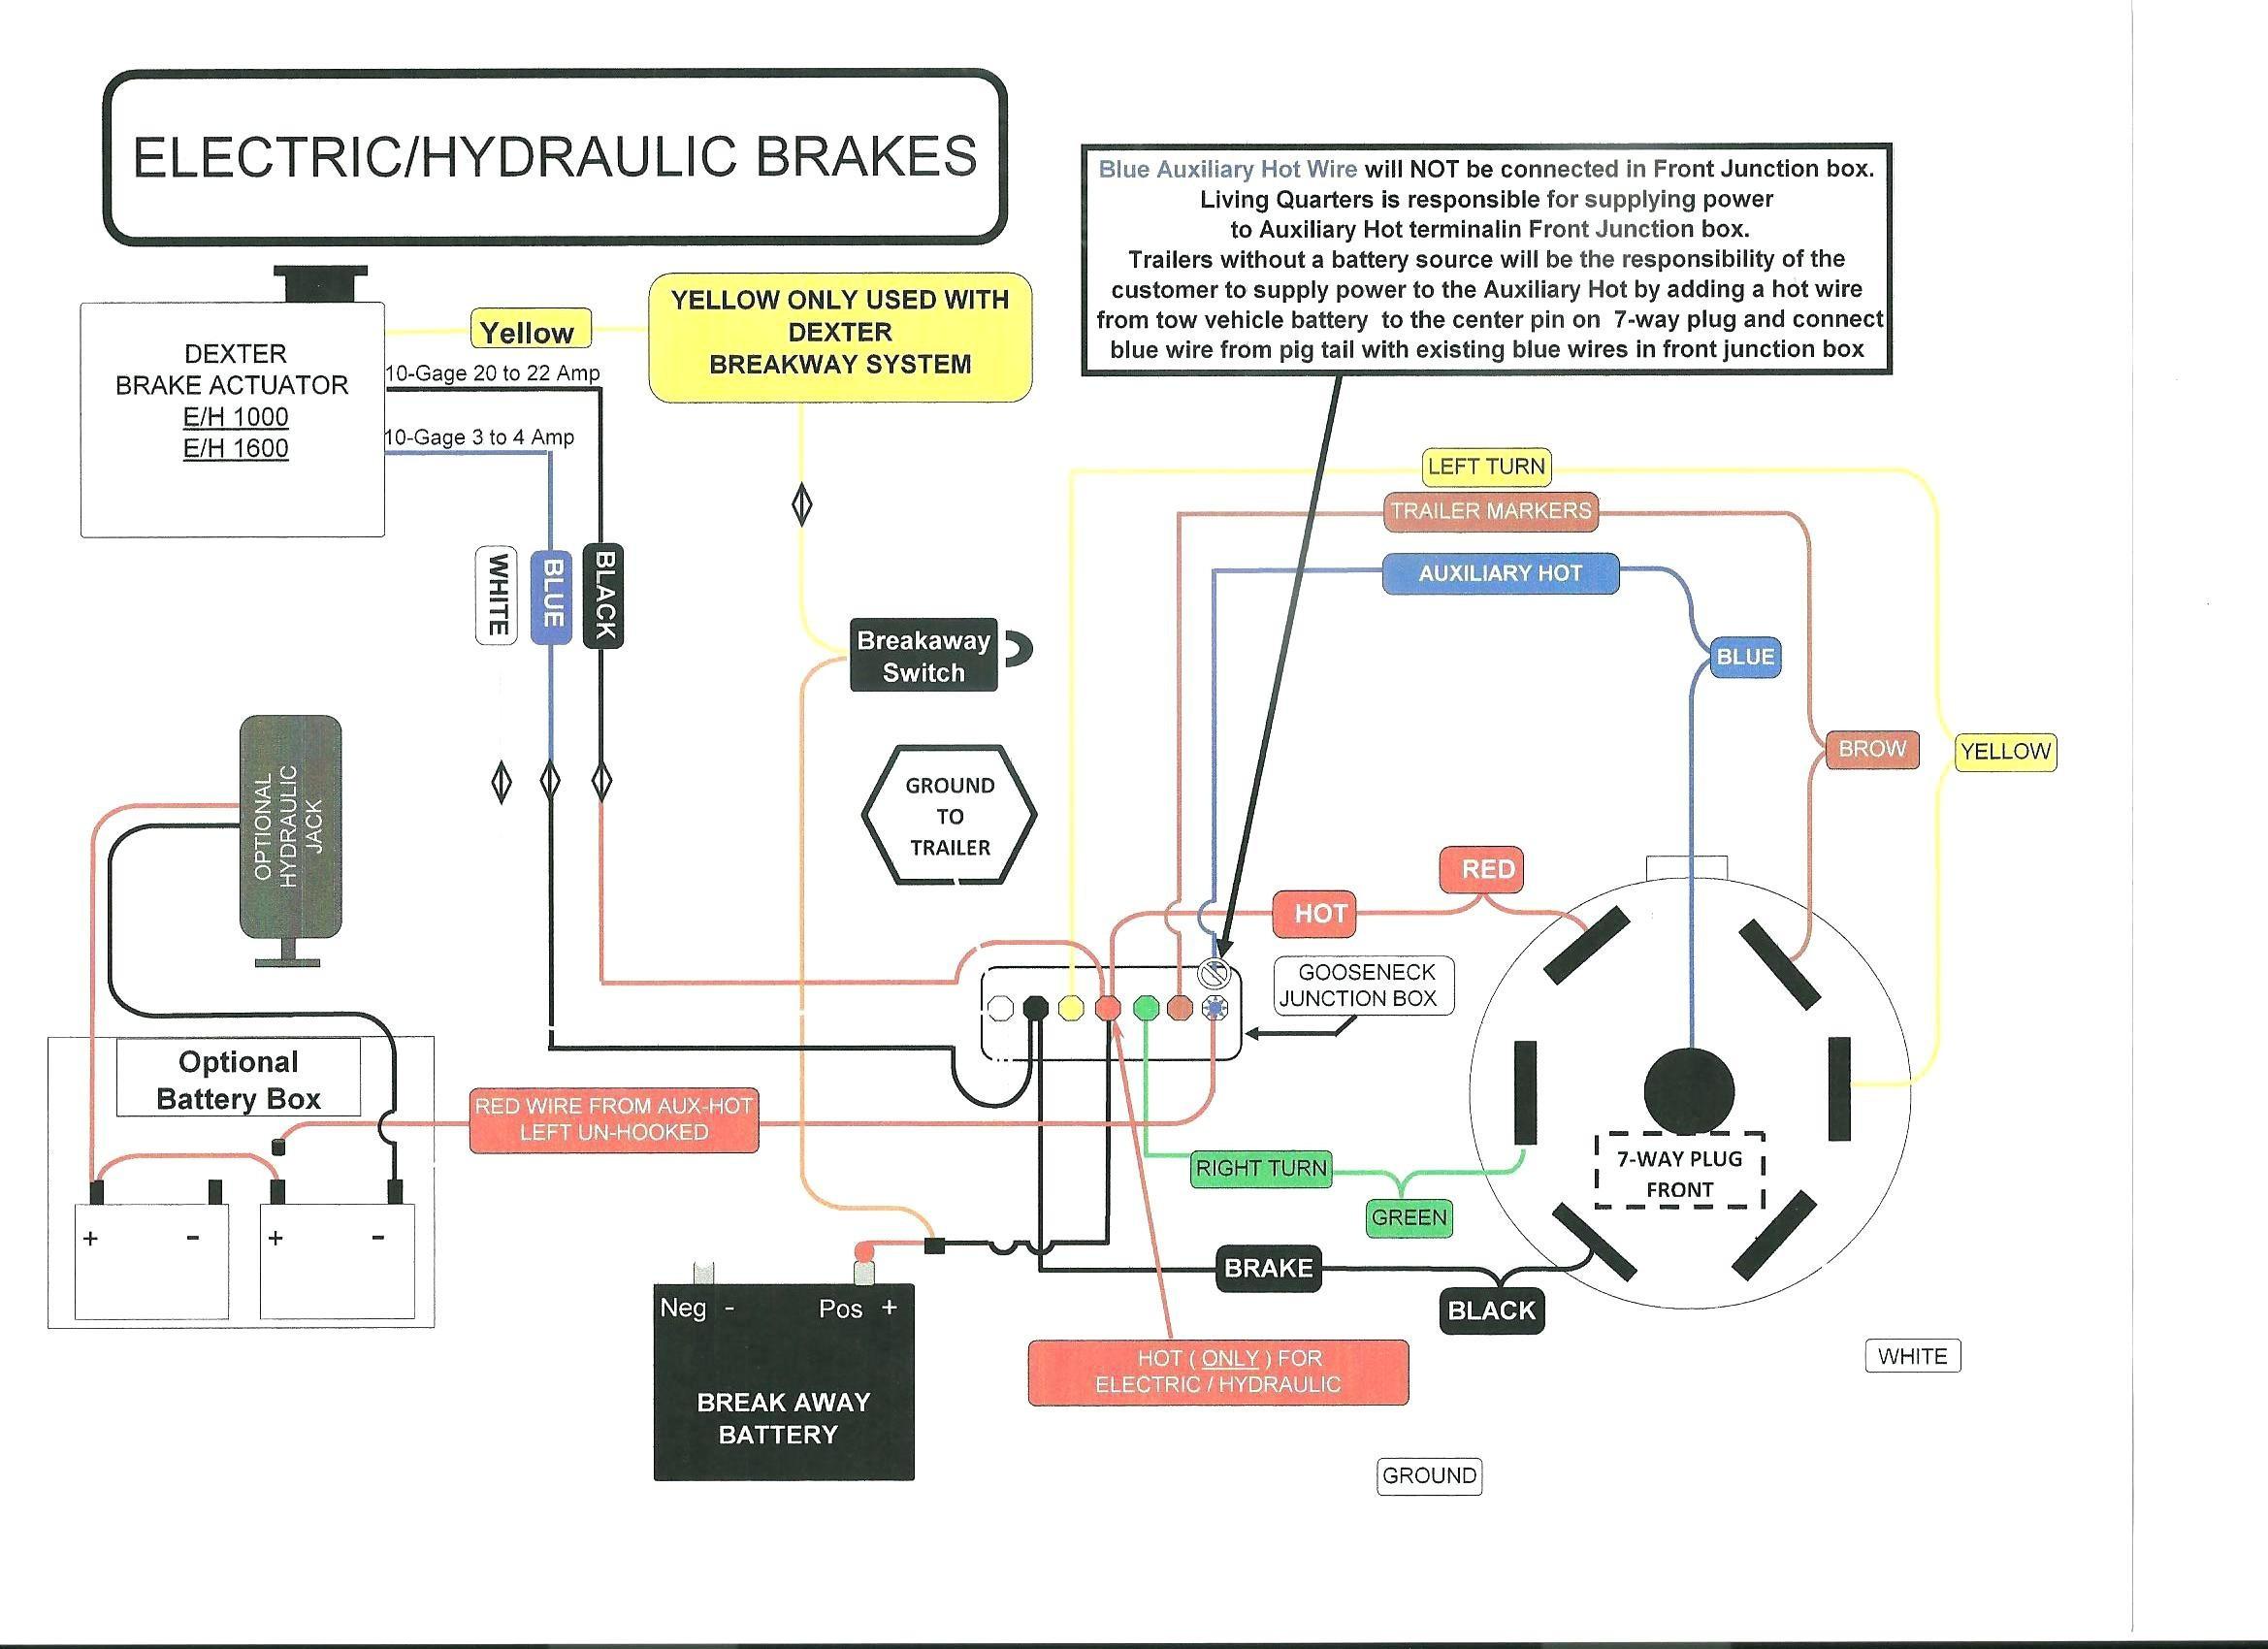 Ww 4895 Electric Trailer Breakaway Wiring Diagram Wiring Diagram